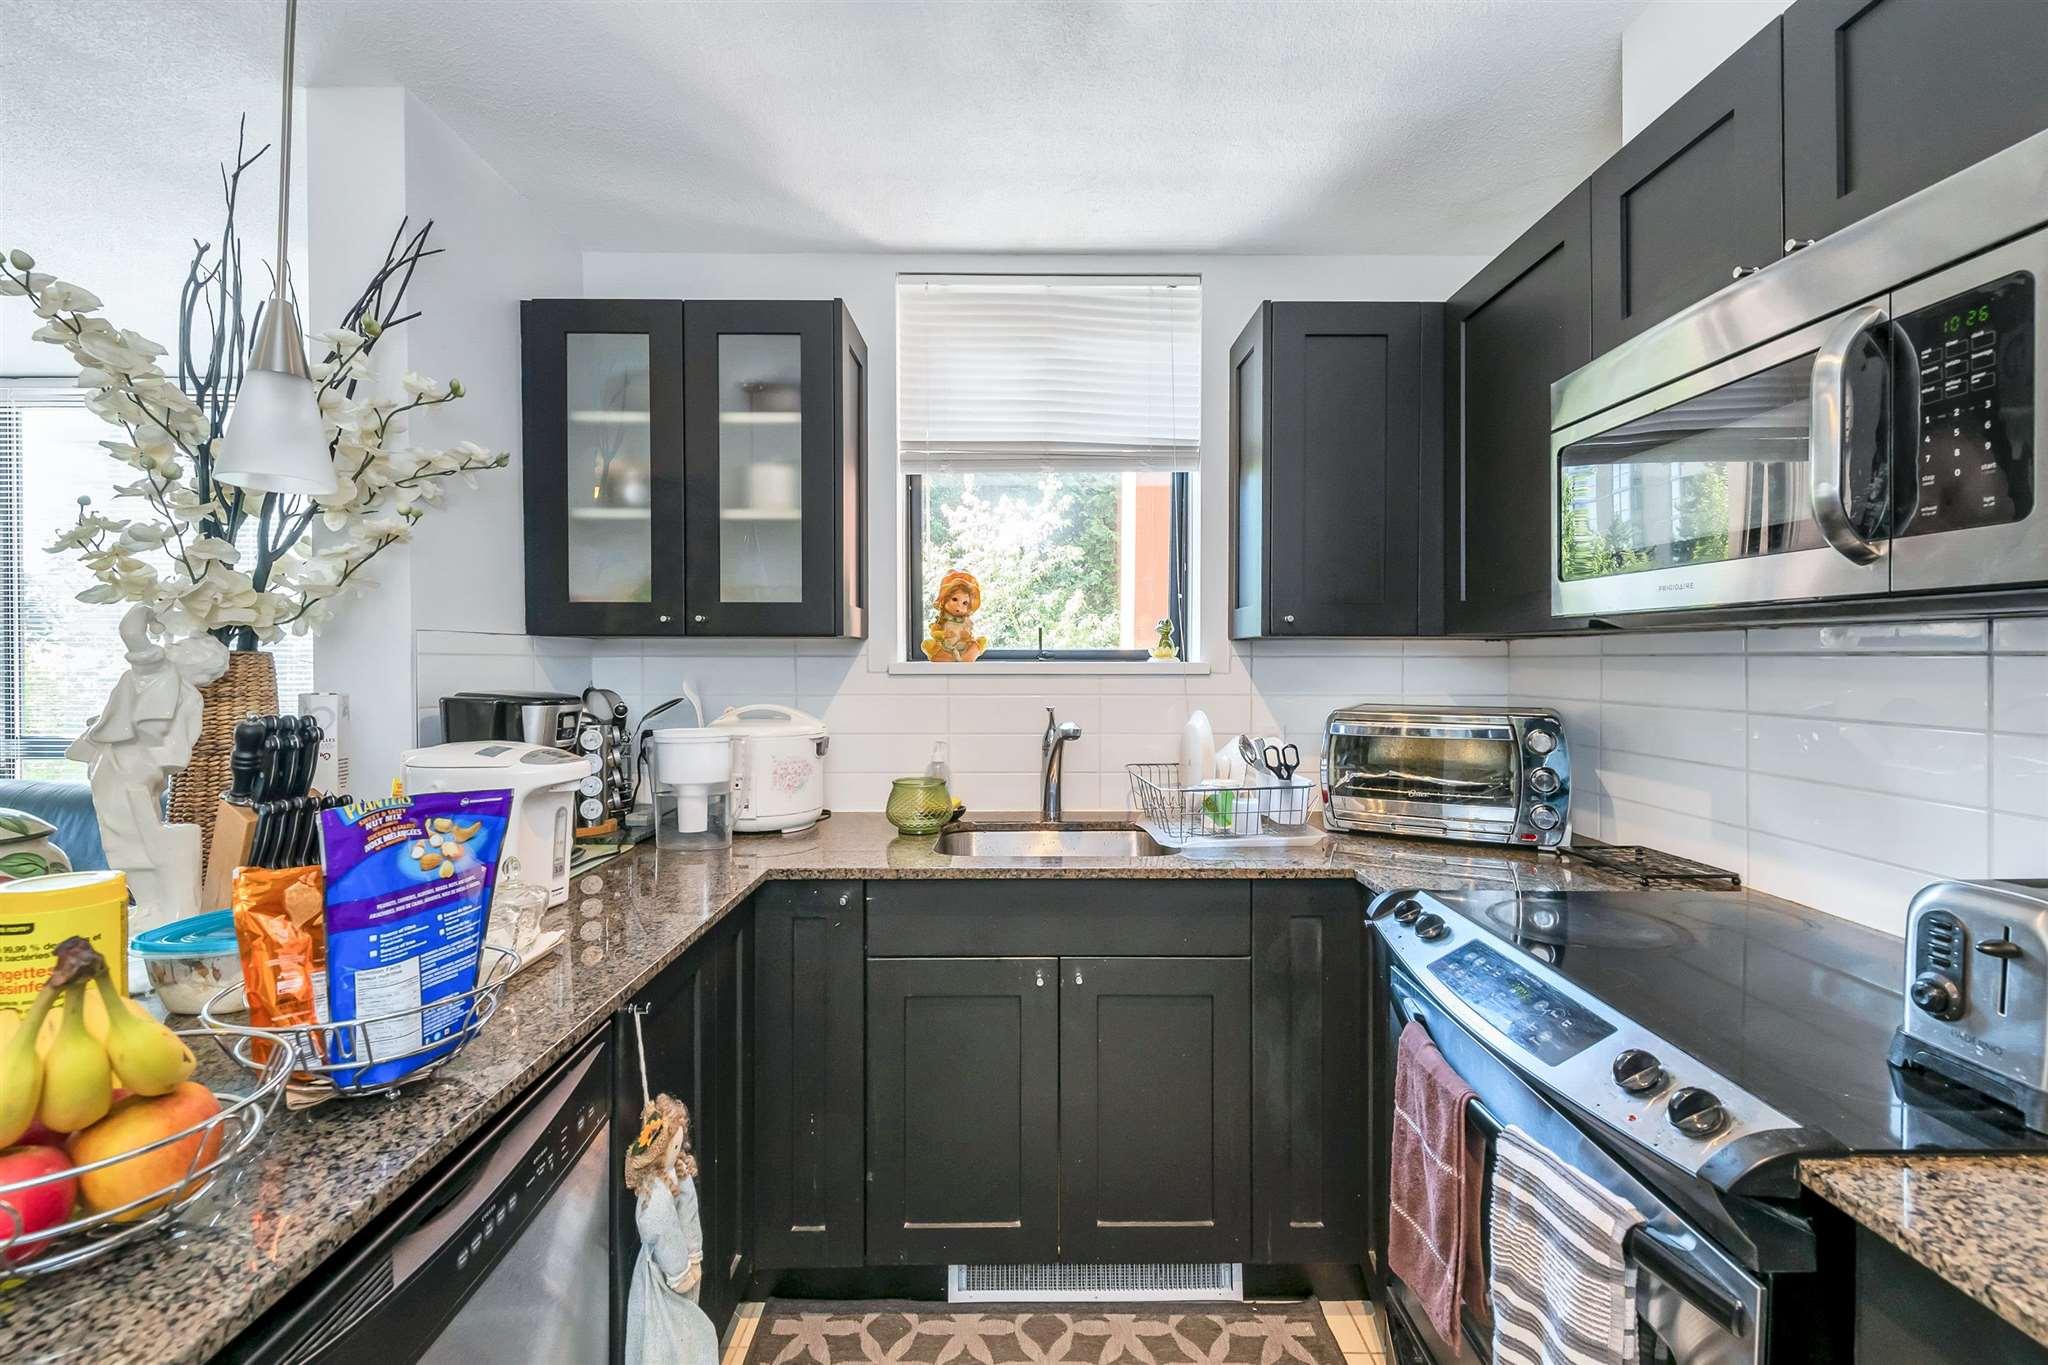 205 7225 ACORN AVENUE - Highgate Apartment/Condo for sale, 2 Bedrooms (R2606454) - #6